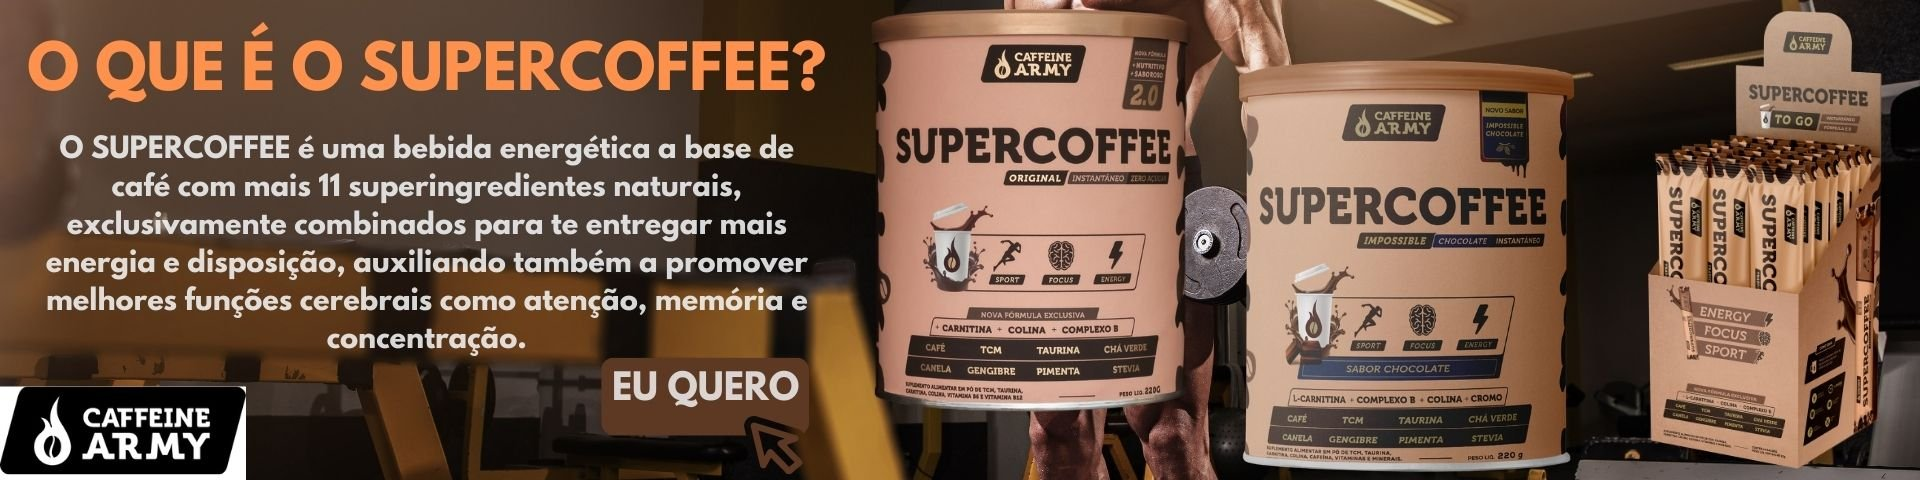 Linha supercoffee